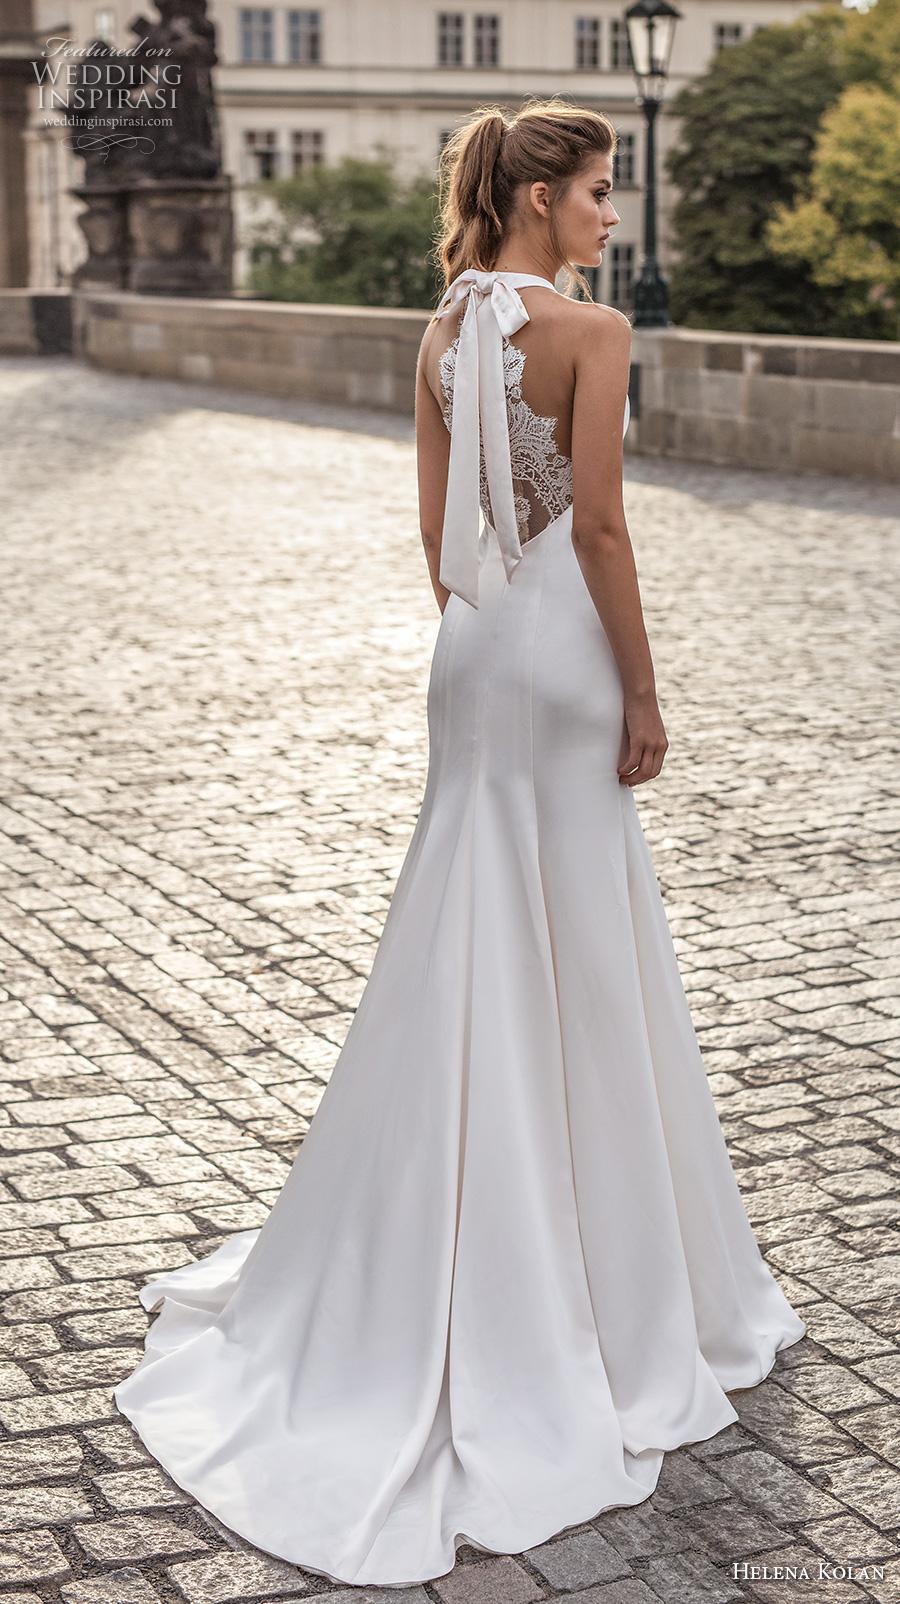 helena kolan 2019 bridal sleeveless halter neck simple clean minimalist elegant drop waist modified a  line wedding dress rasor back medium train (16) bv